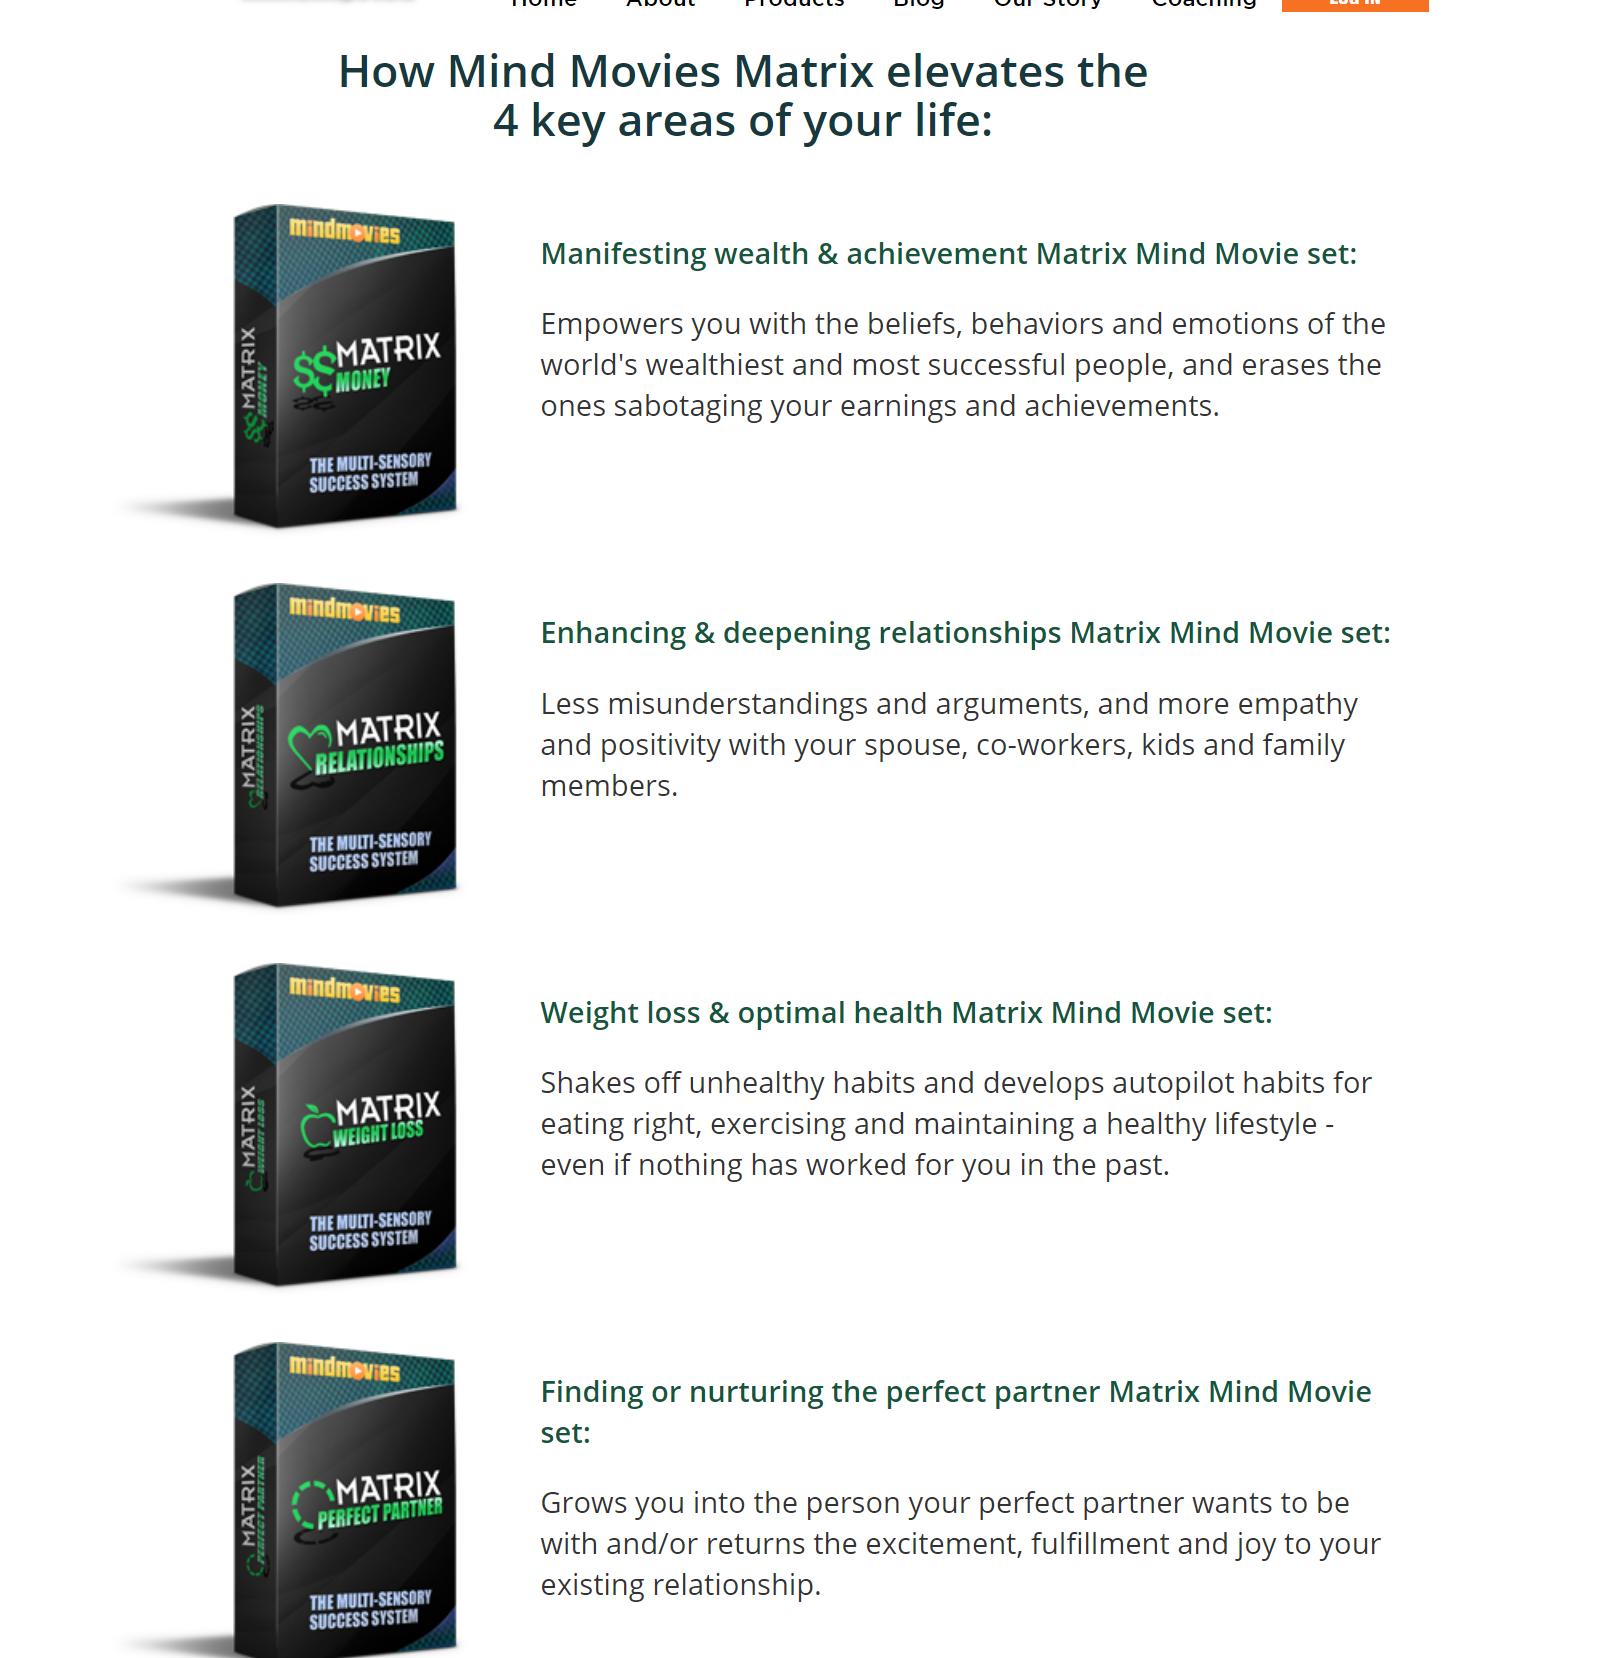 Mind Movies Matrix key areas of life